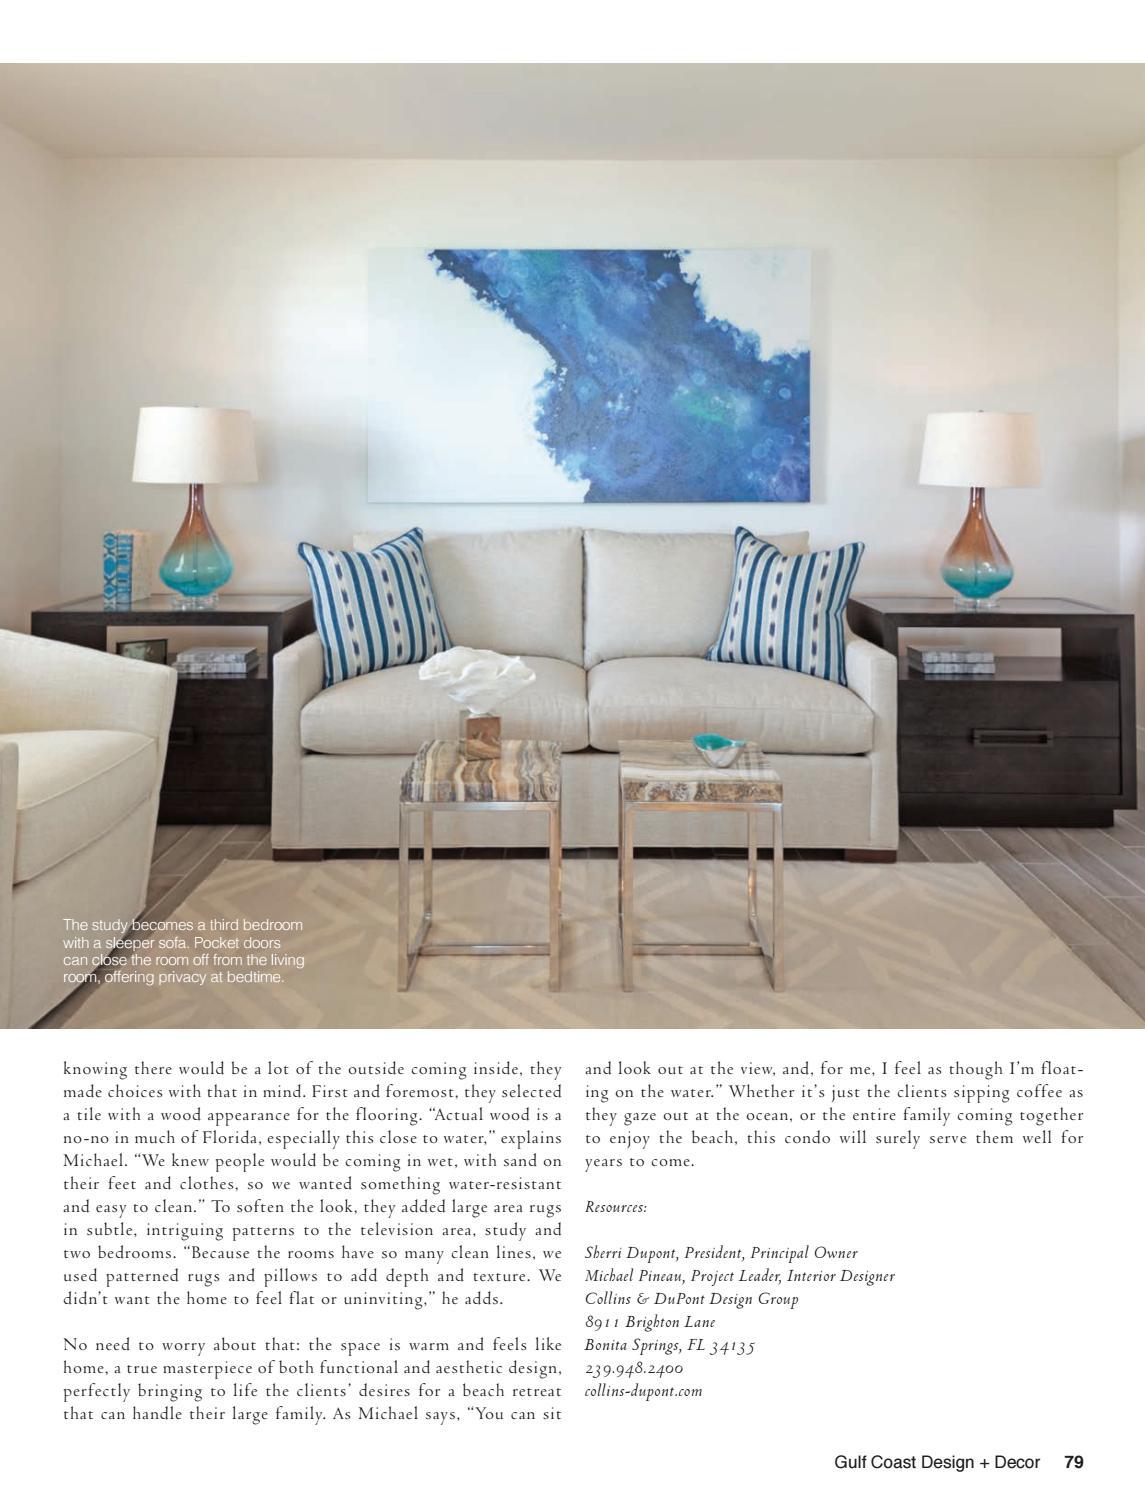 Collins & Dupont Design Group gulf coast design + decor by east coast home publishing - issuu